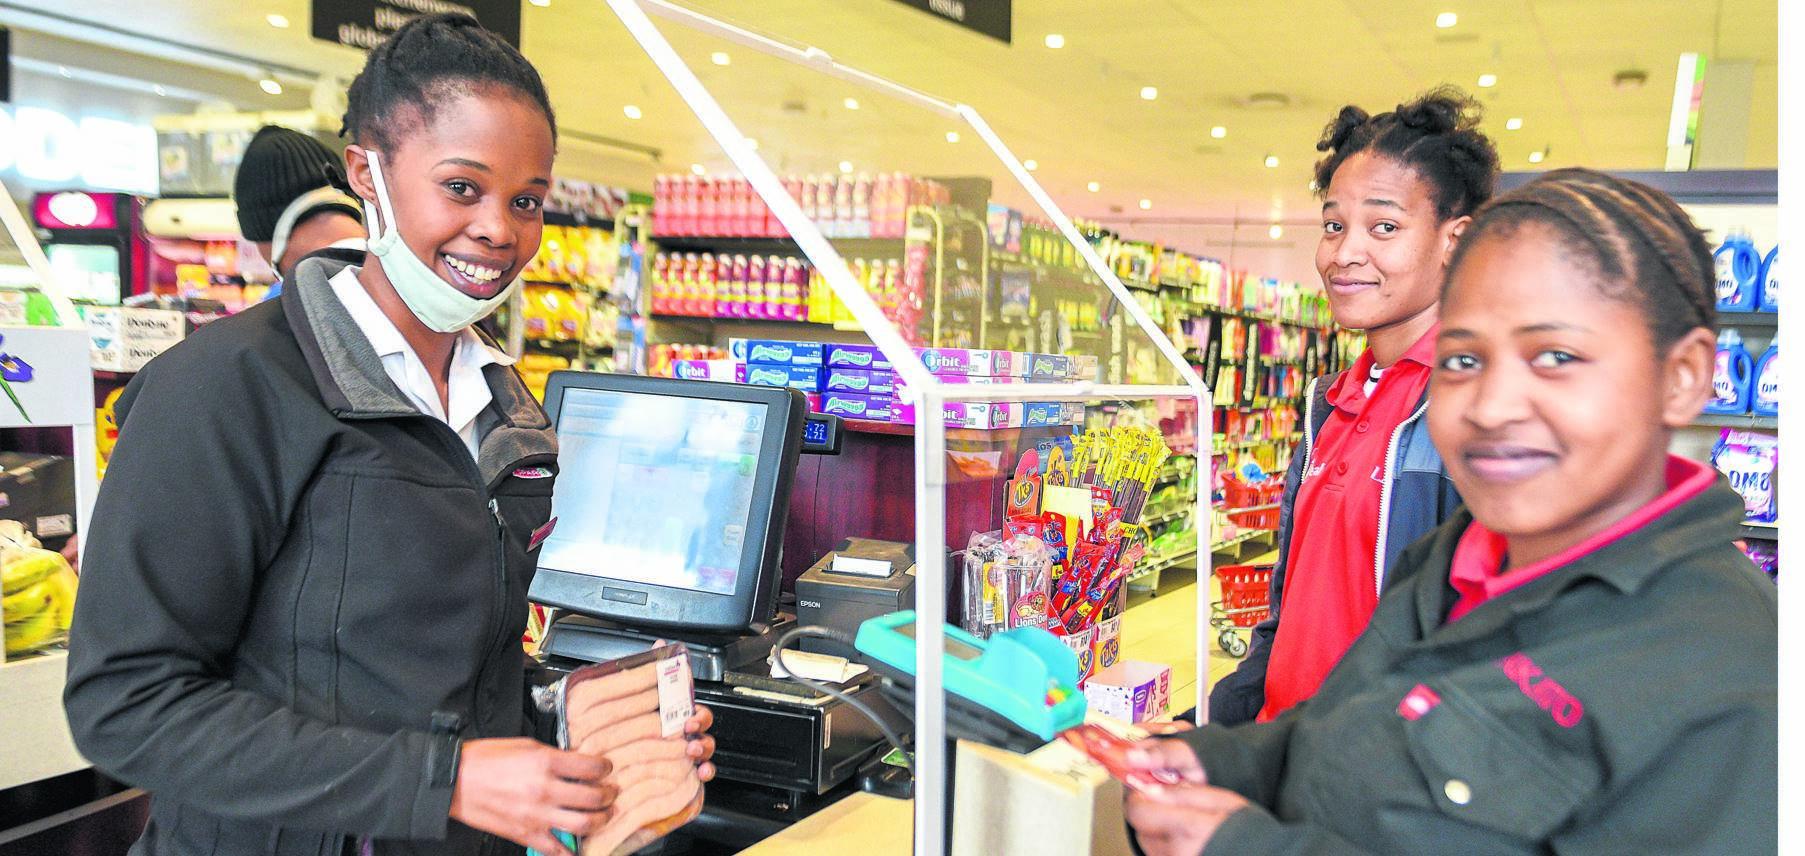 Thando Mkhize, runs operations for online orders at Parklane Spar. Here she helps in-store customers Sibongile Ngubane and Vuyelwa Tombani. PHOTO: Moeketsi Mamane